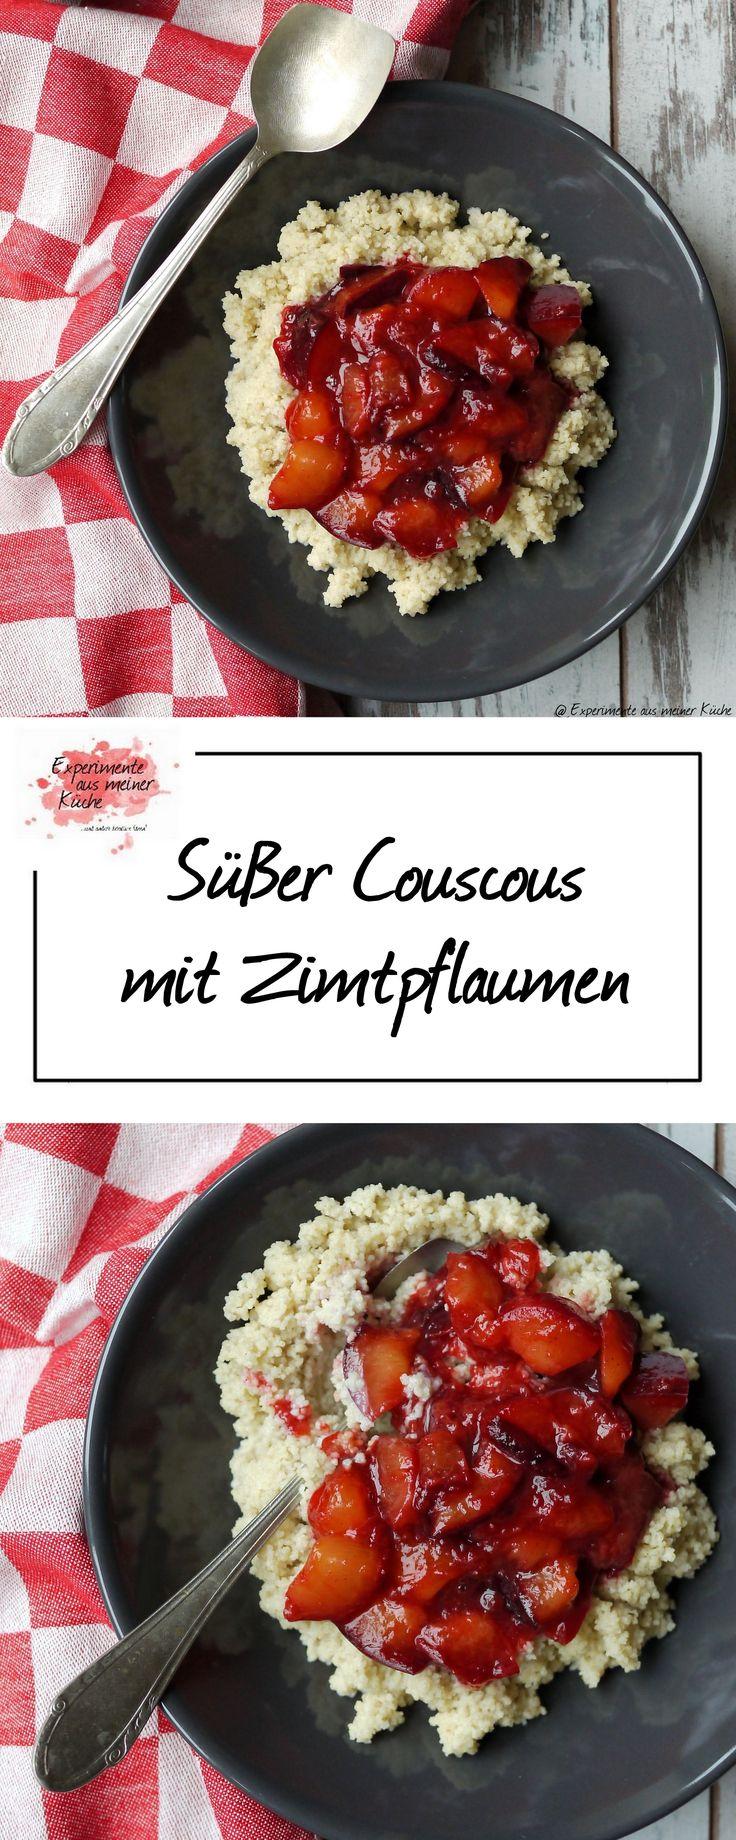 Süßer Couscous mit Zimtpflaumen   Rezept   Kochen